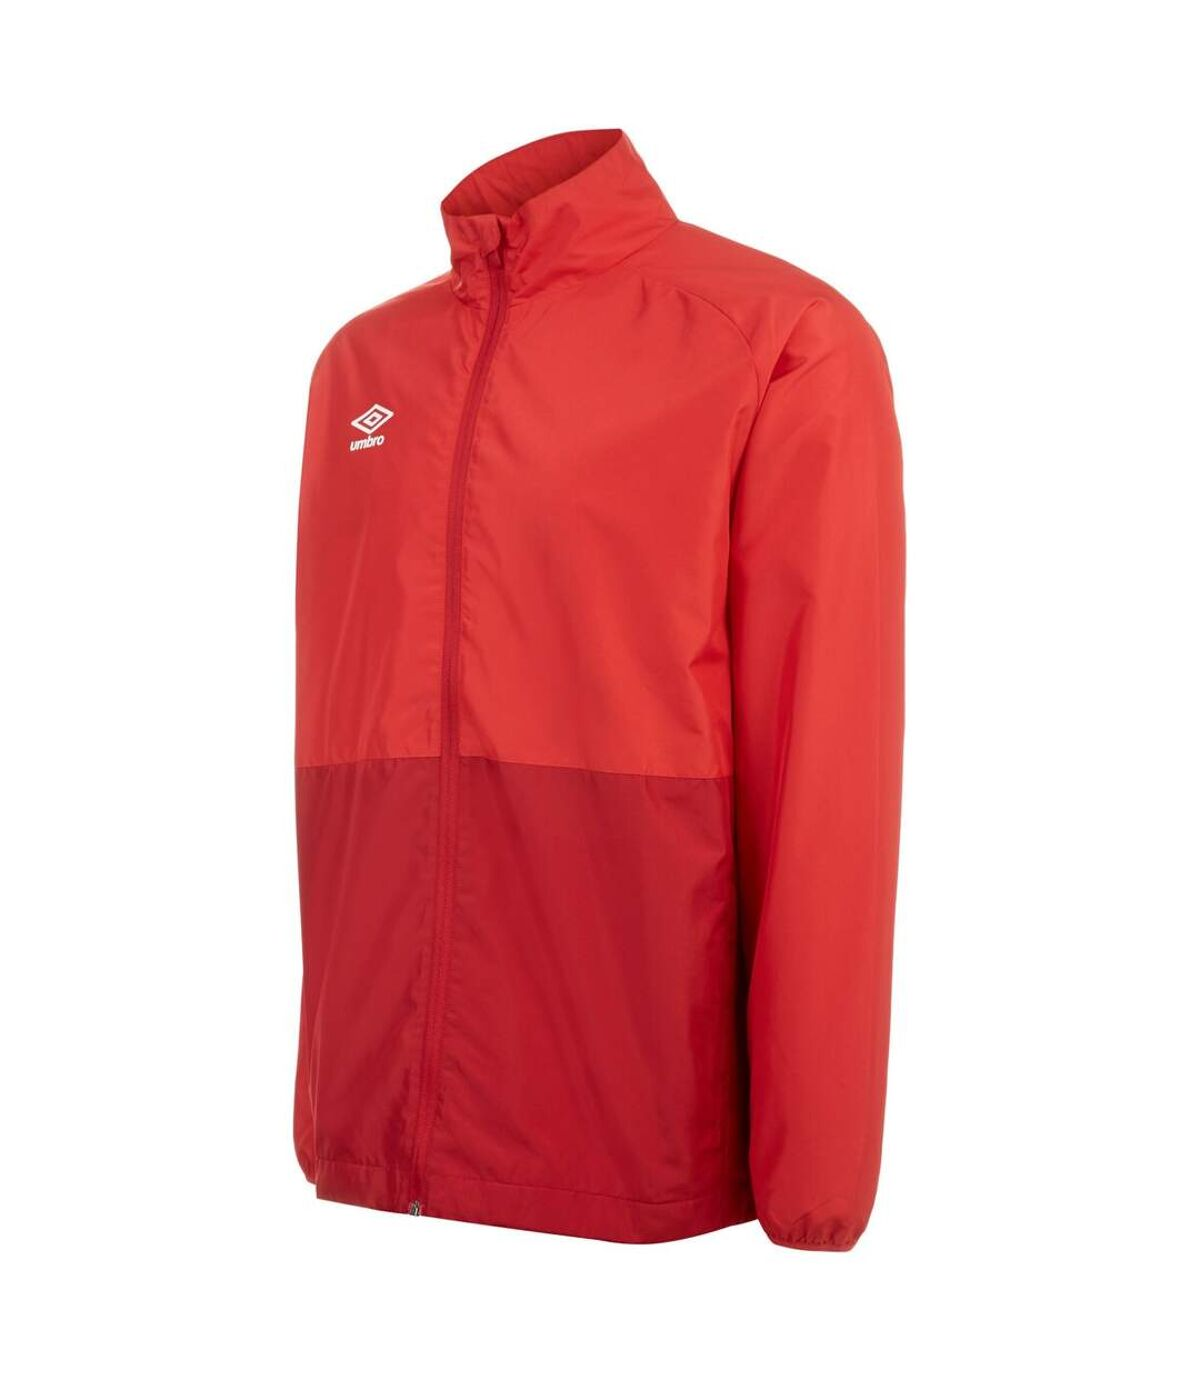 Umbro Mens Showerproof Training Jacket (Vermillion/Jester Red) - UTGD109